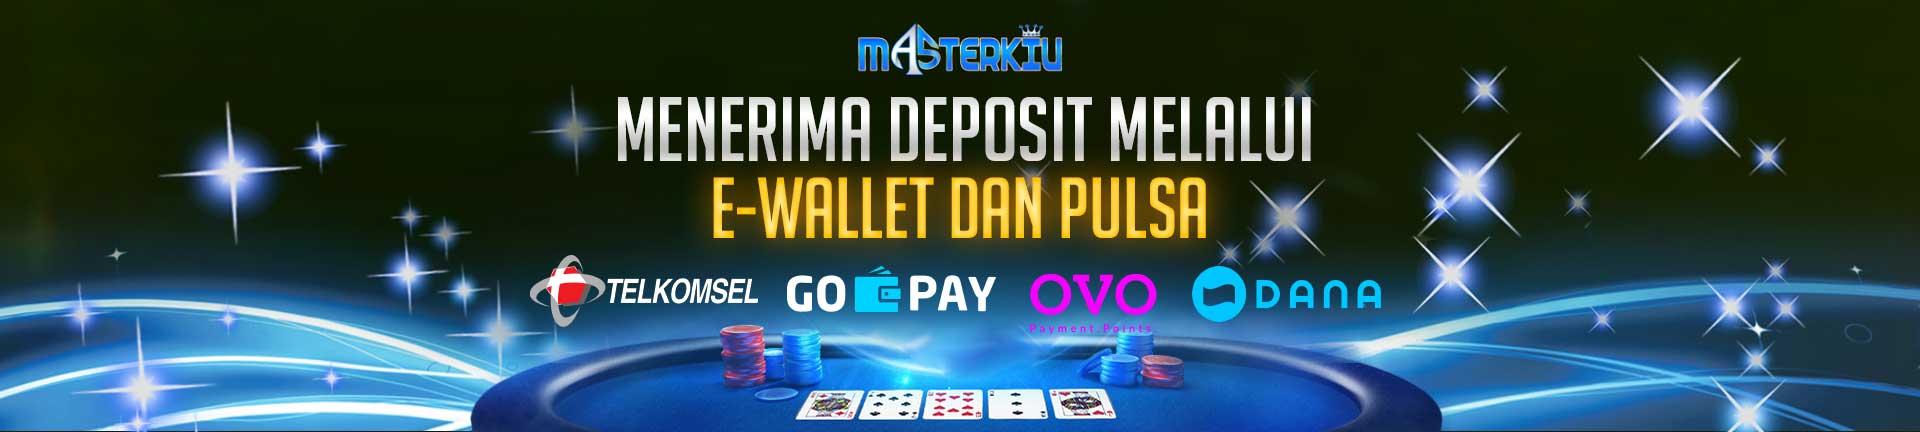 Deposit pulsa pkv games di masterkiu